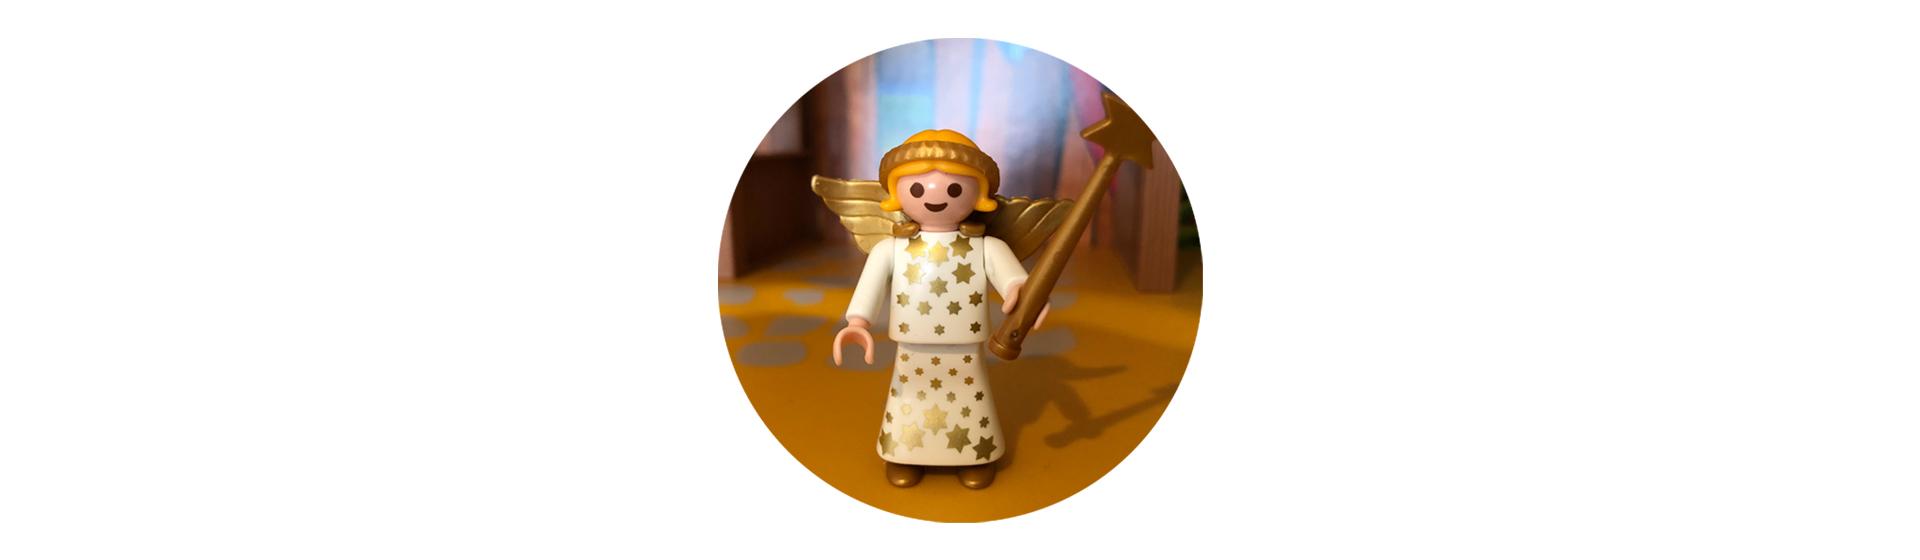 article-thebirthofjesus-playmobile-angel